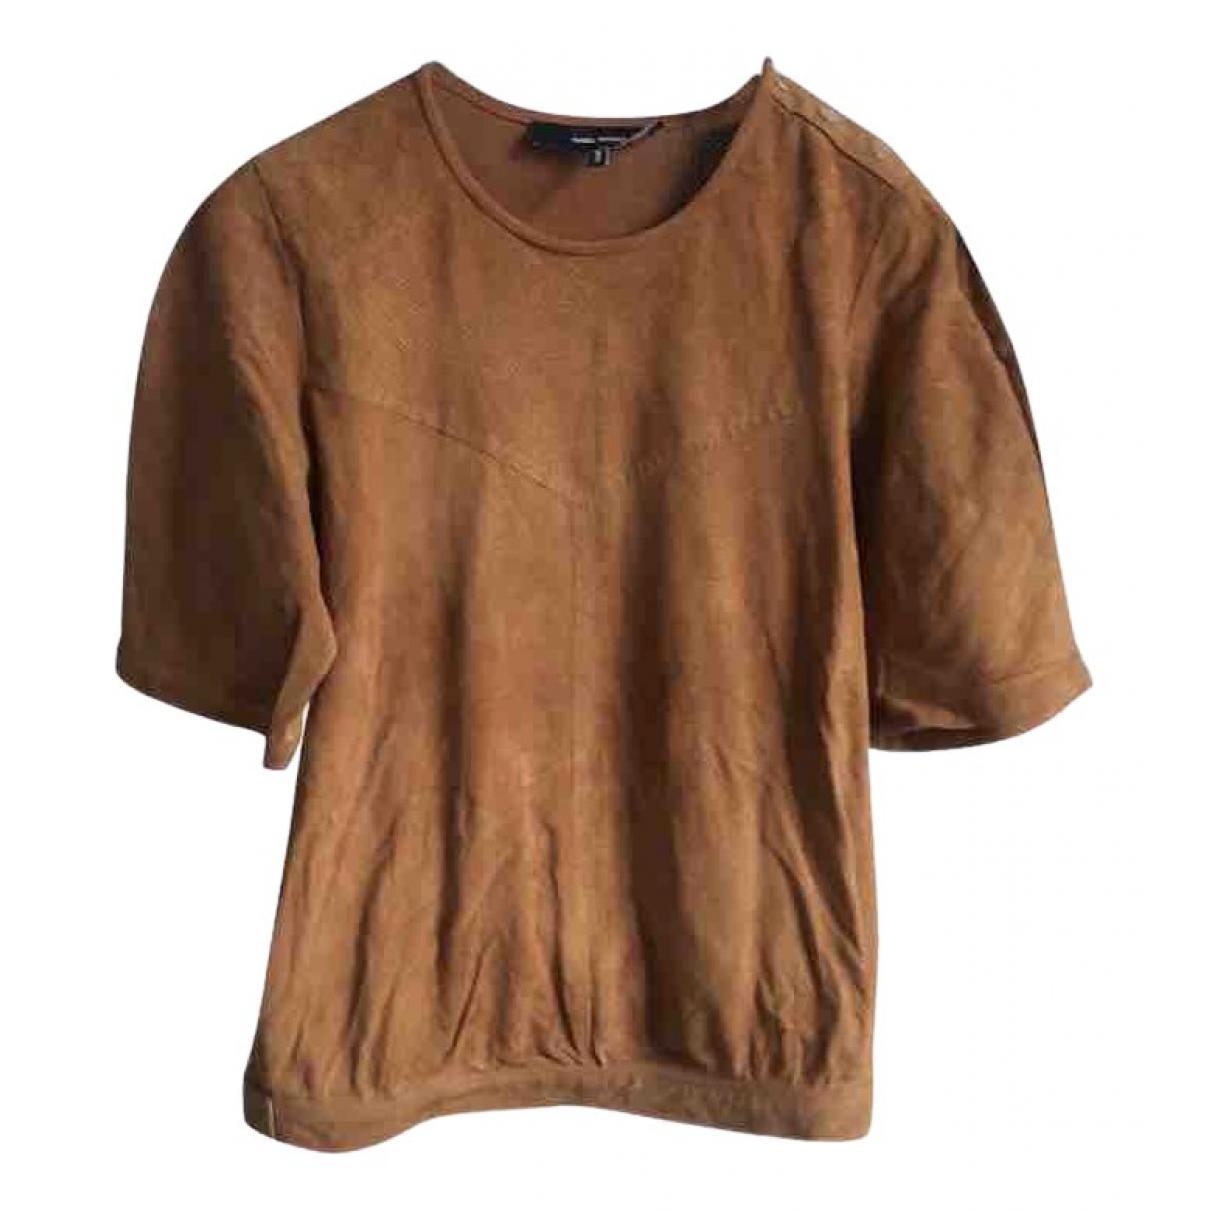 Isabel Marant \N Camel Leather  top for Women 34 FR